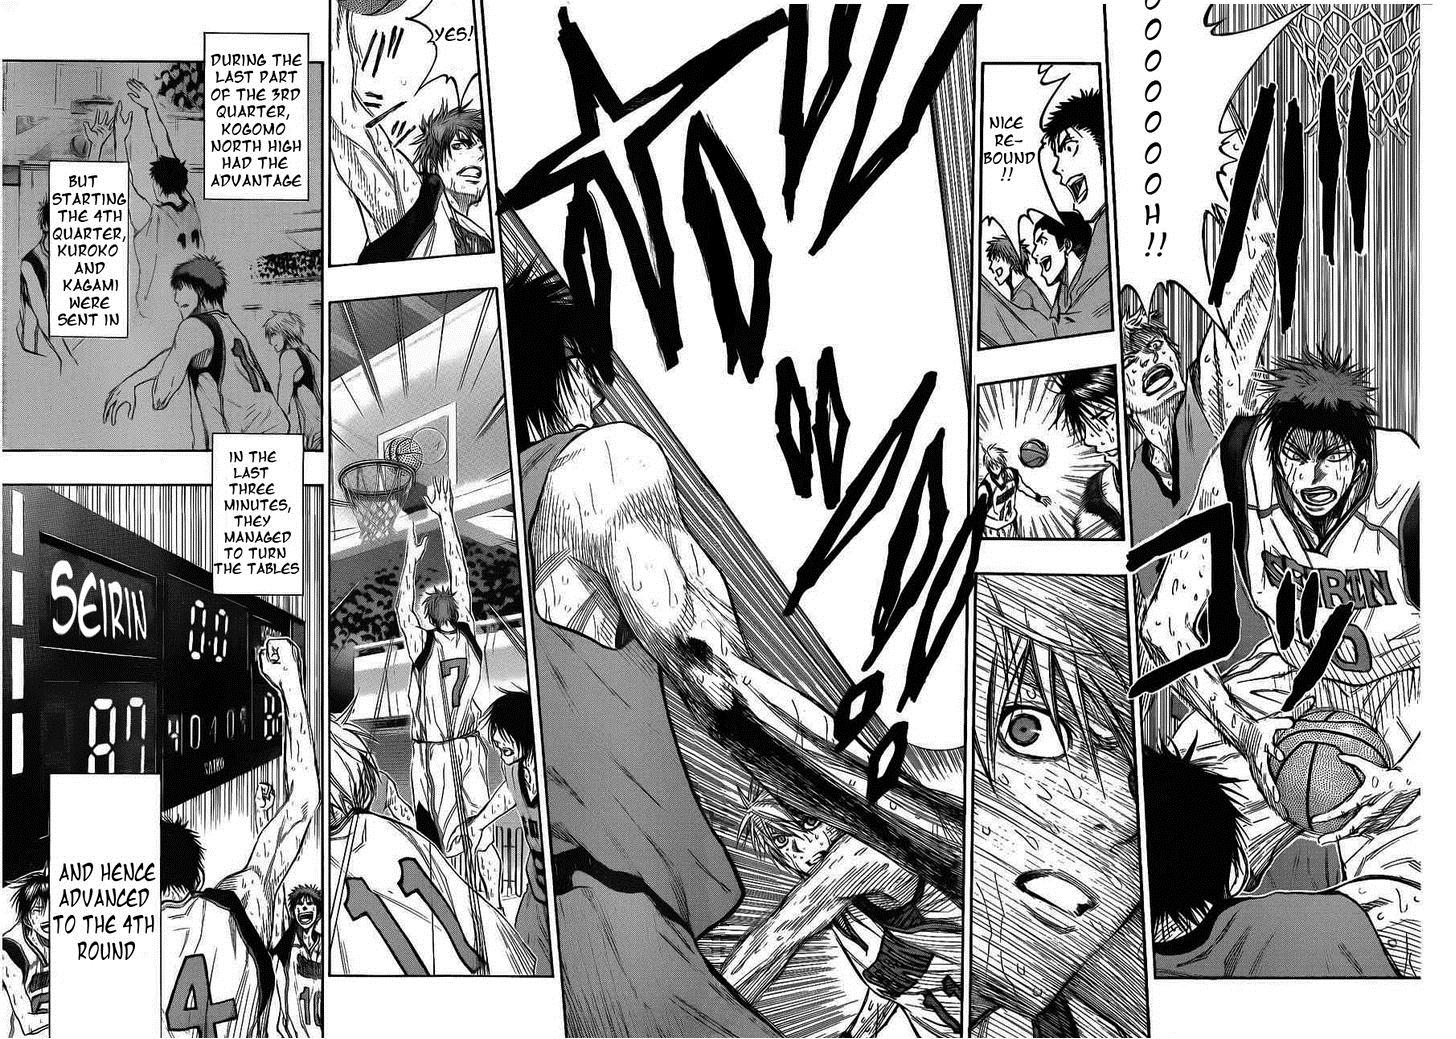 Kuroko no Basket Manga Chapter 144 - Image 06-07